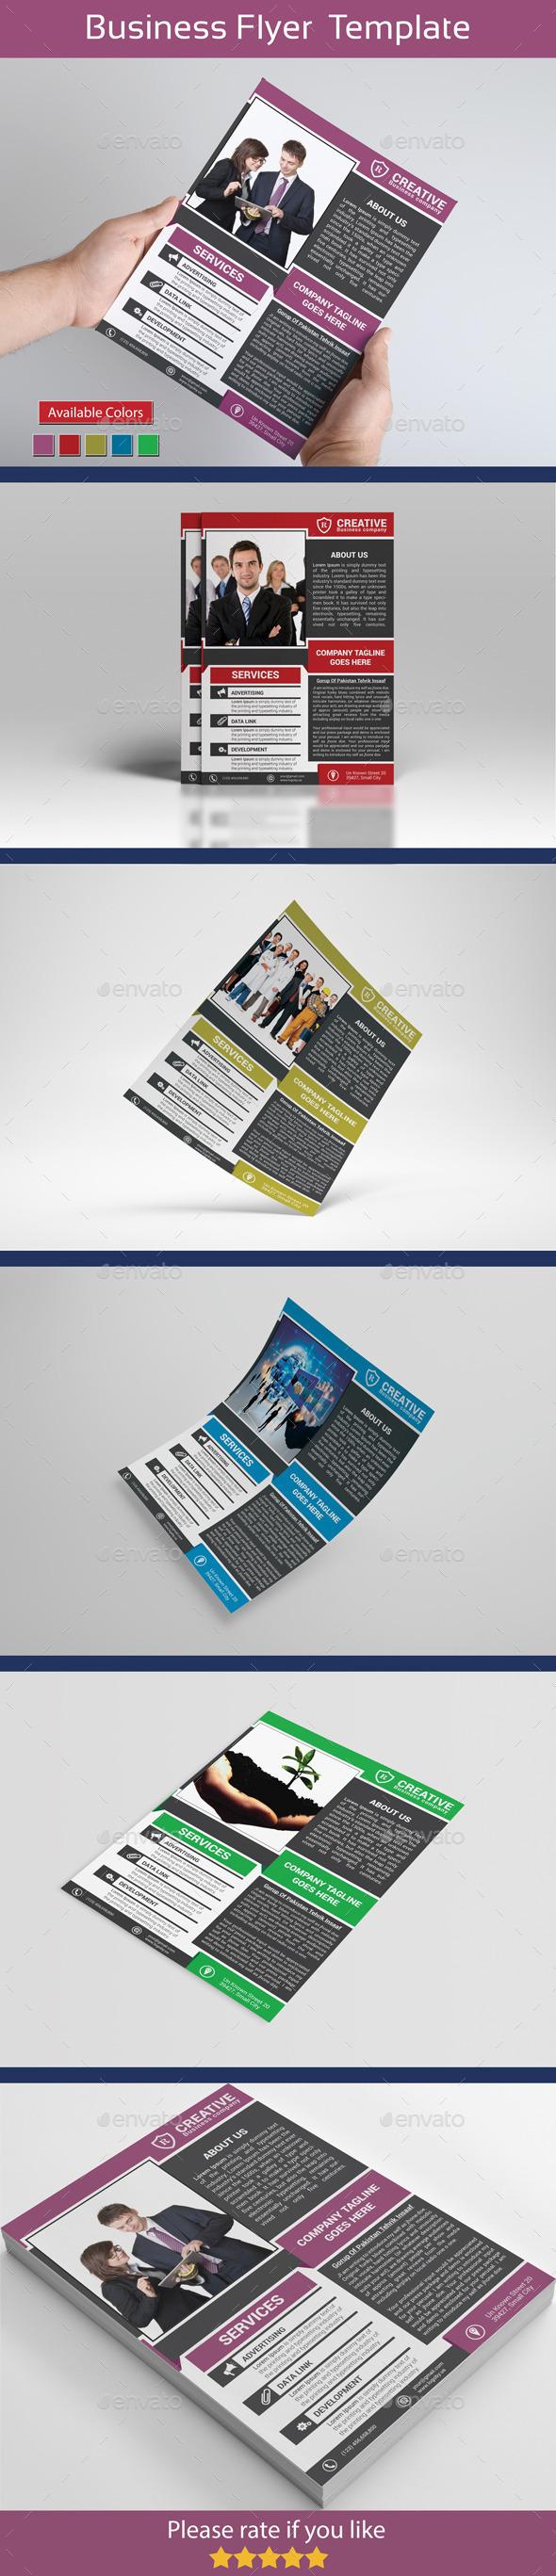 Creative Flyer  Template  - Flyers Print Templates